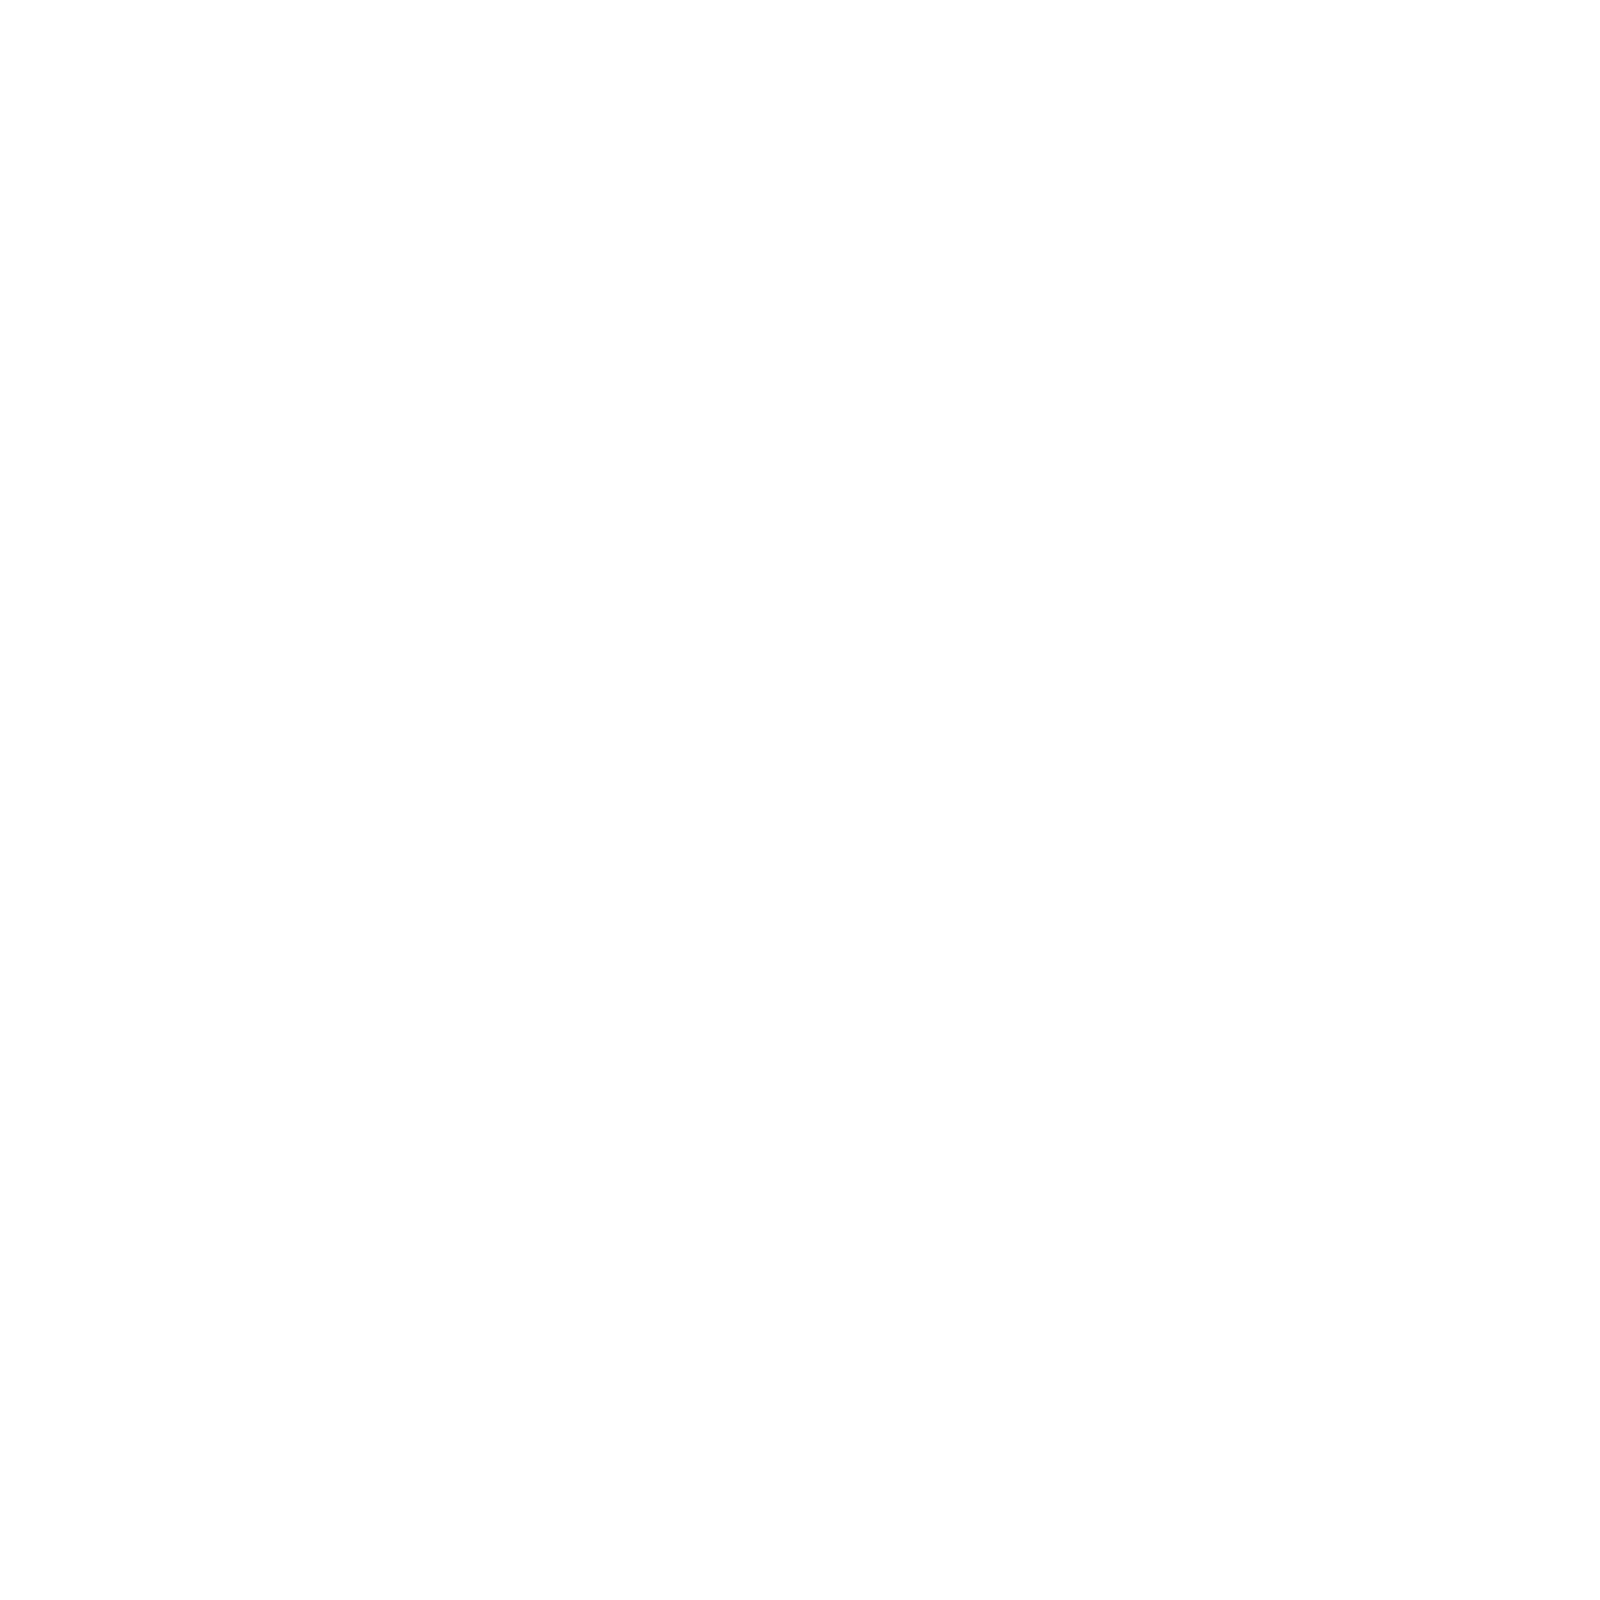 J&B-project-logo.png